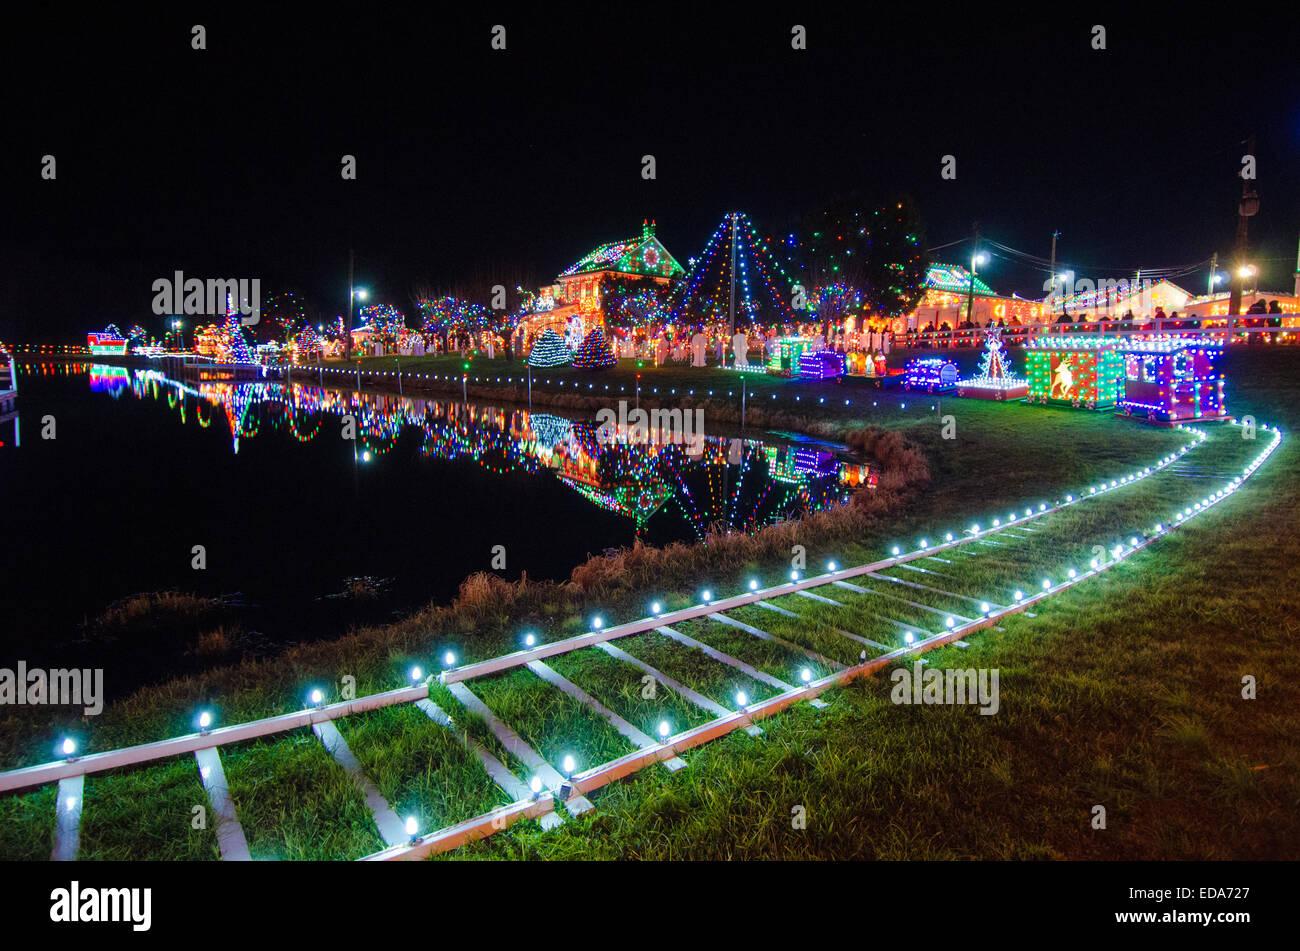 Over a million Christmas lights adorn Koziar's Christmas Village ...